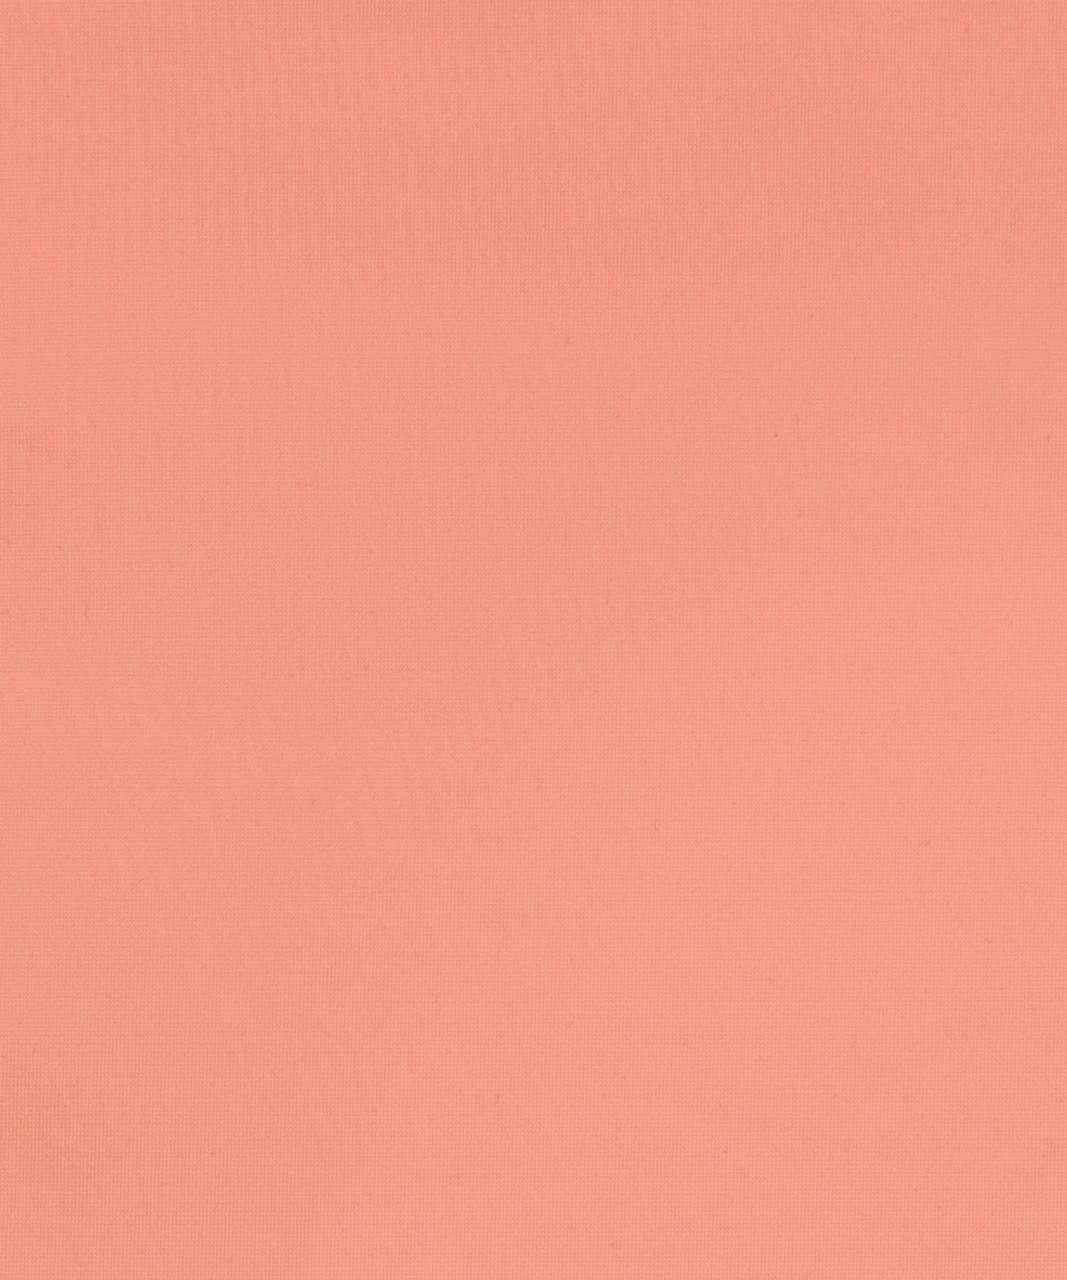 Lululemon Smooth Seamless Hipster 3 Pack - Pink Savannah / Smoky Topaz / Misty Shell